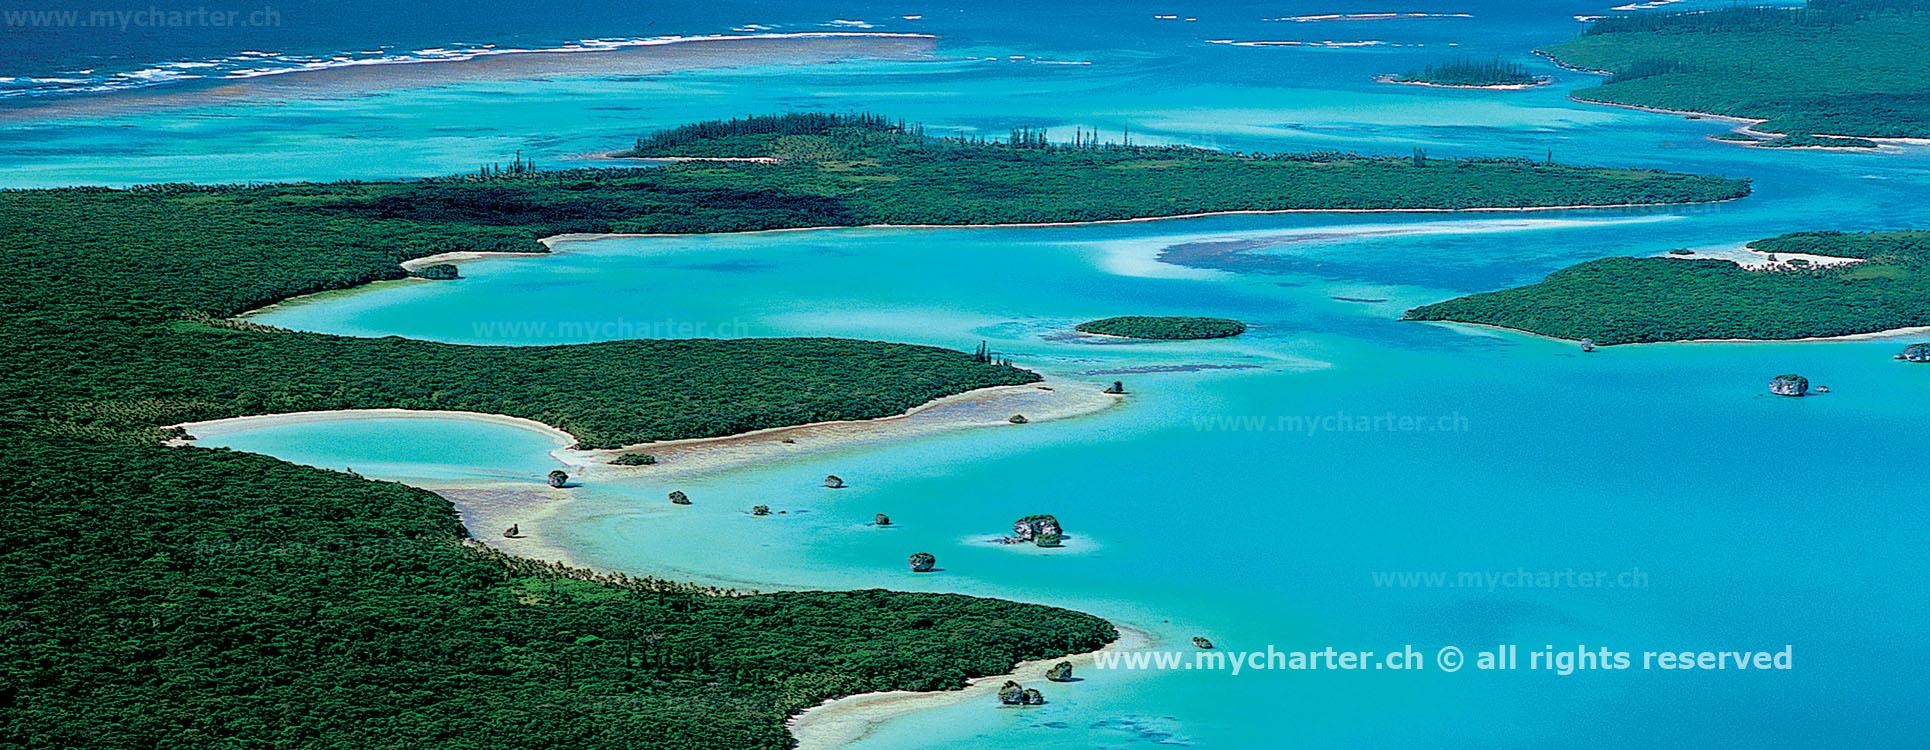 Neukaledonien - Ile des Pins